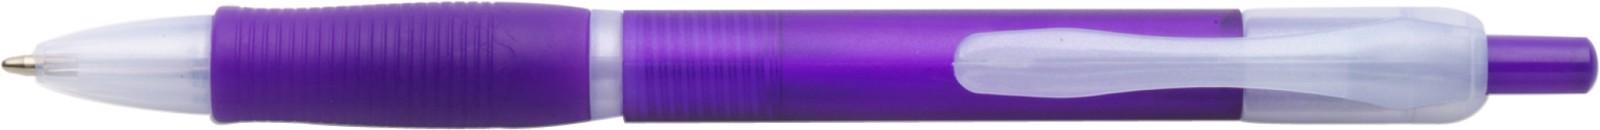 AS ballpen - Purple